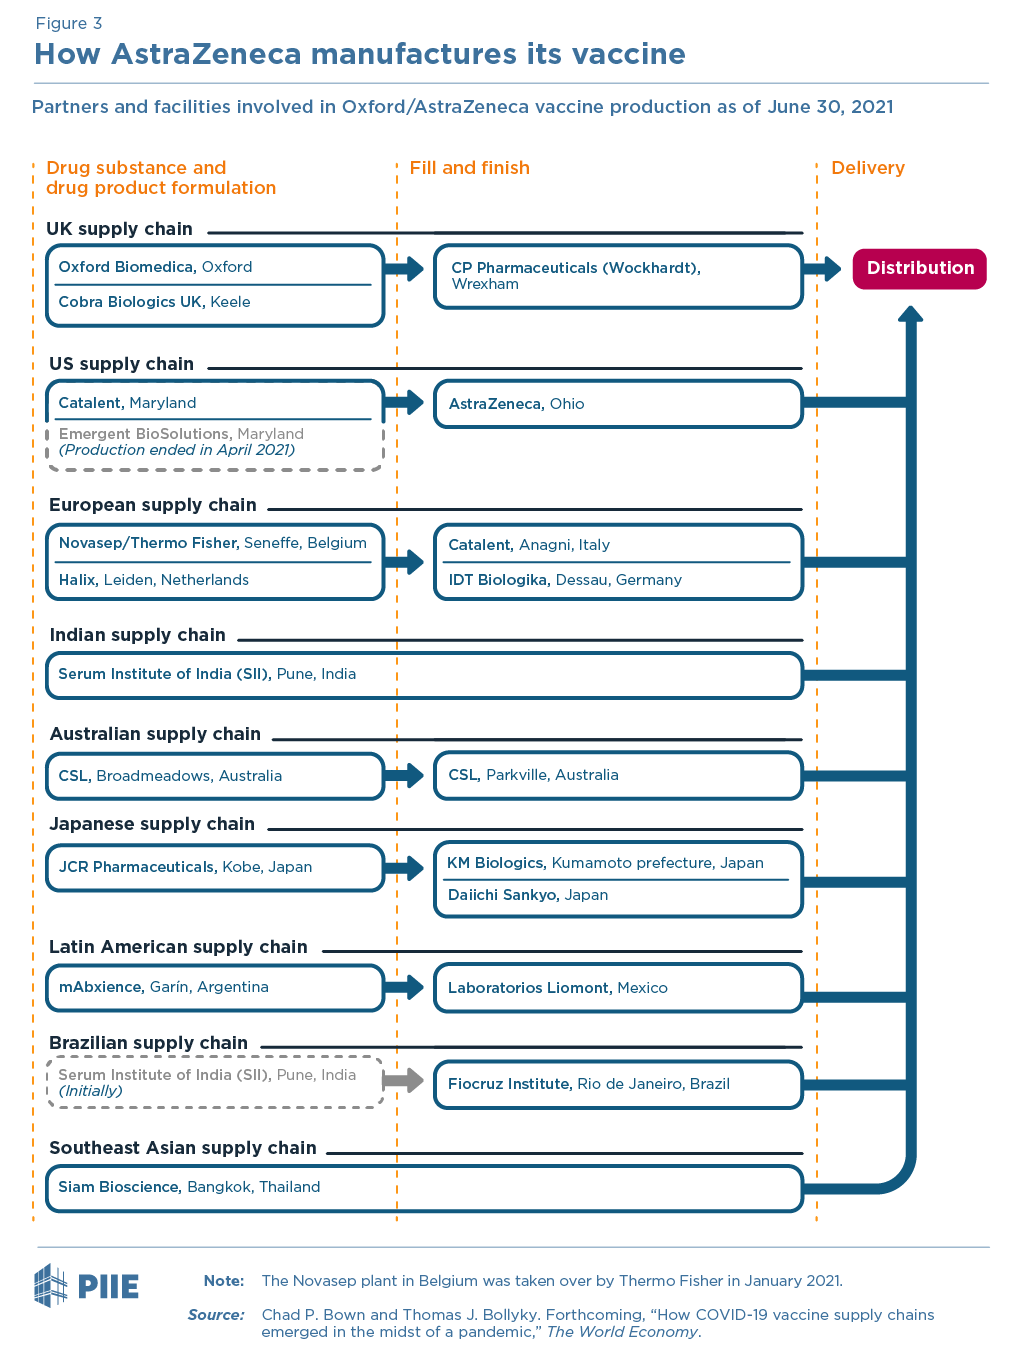 Figure 3 How AstraZeneca manufactures its vaccine